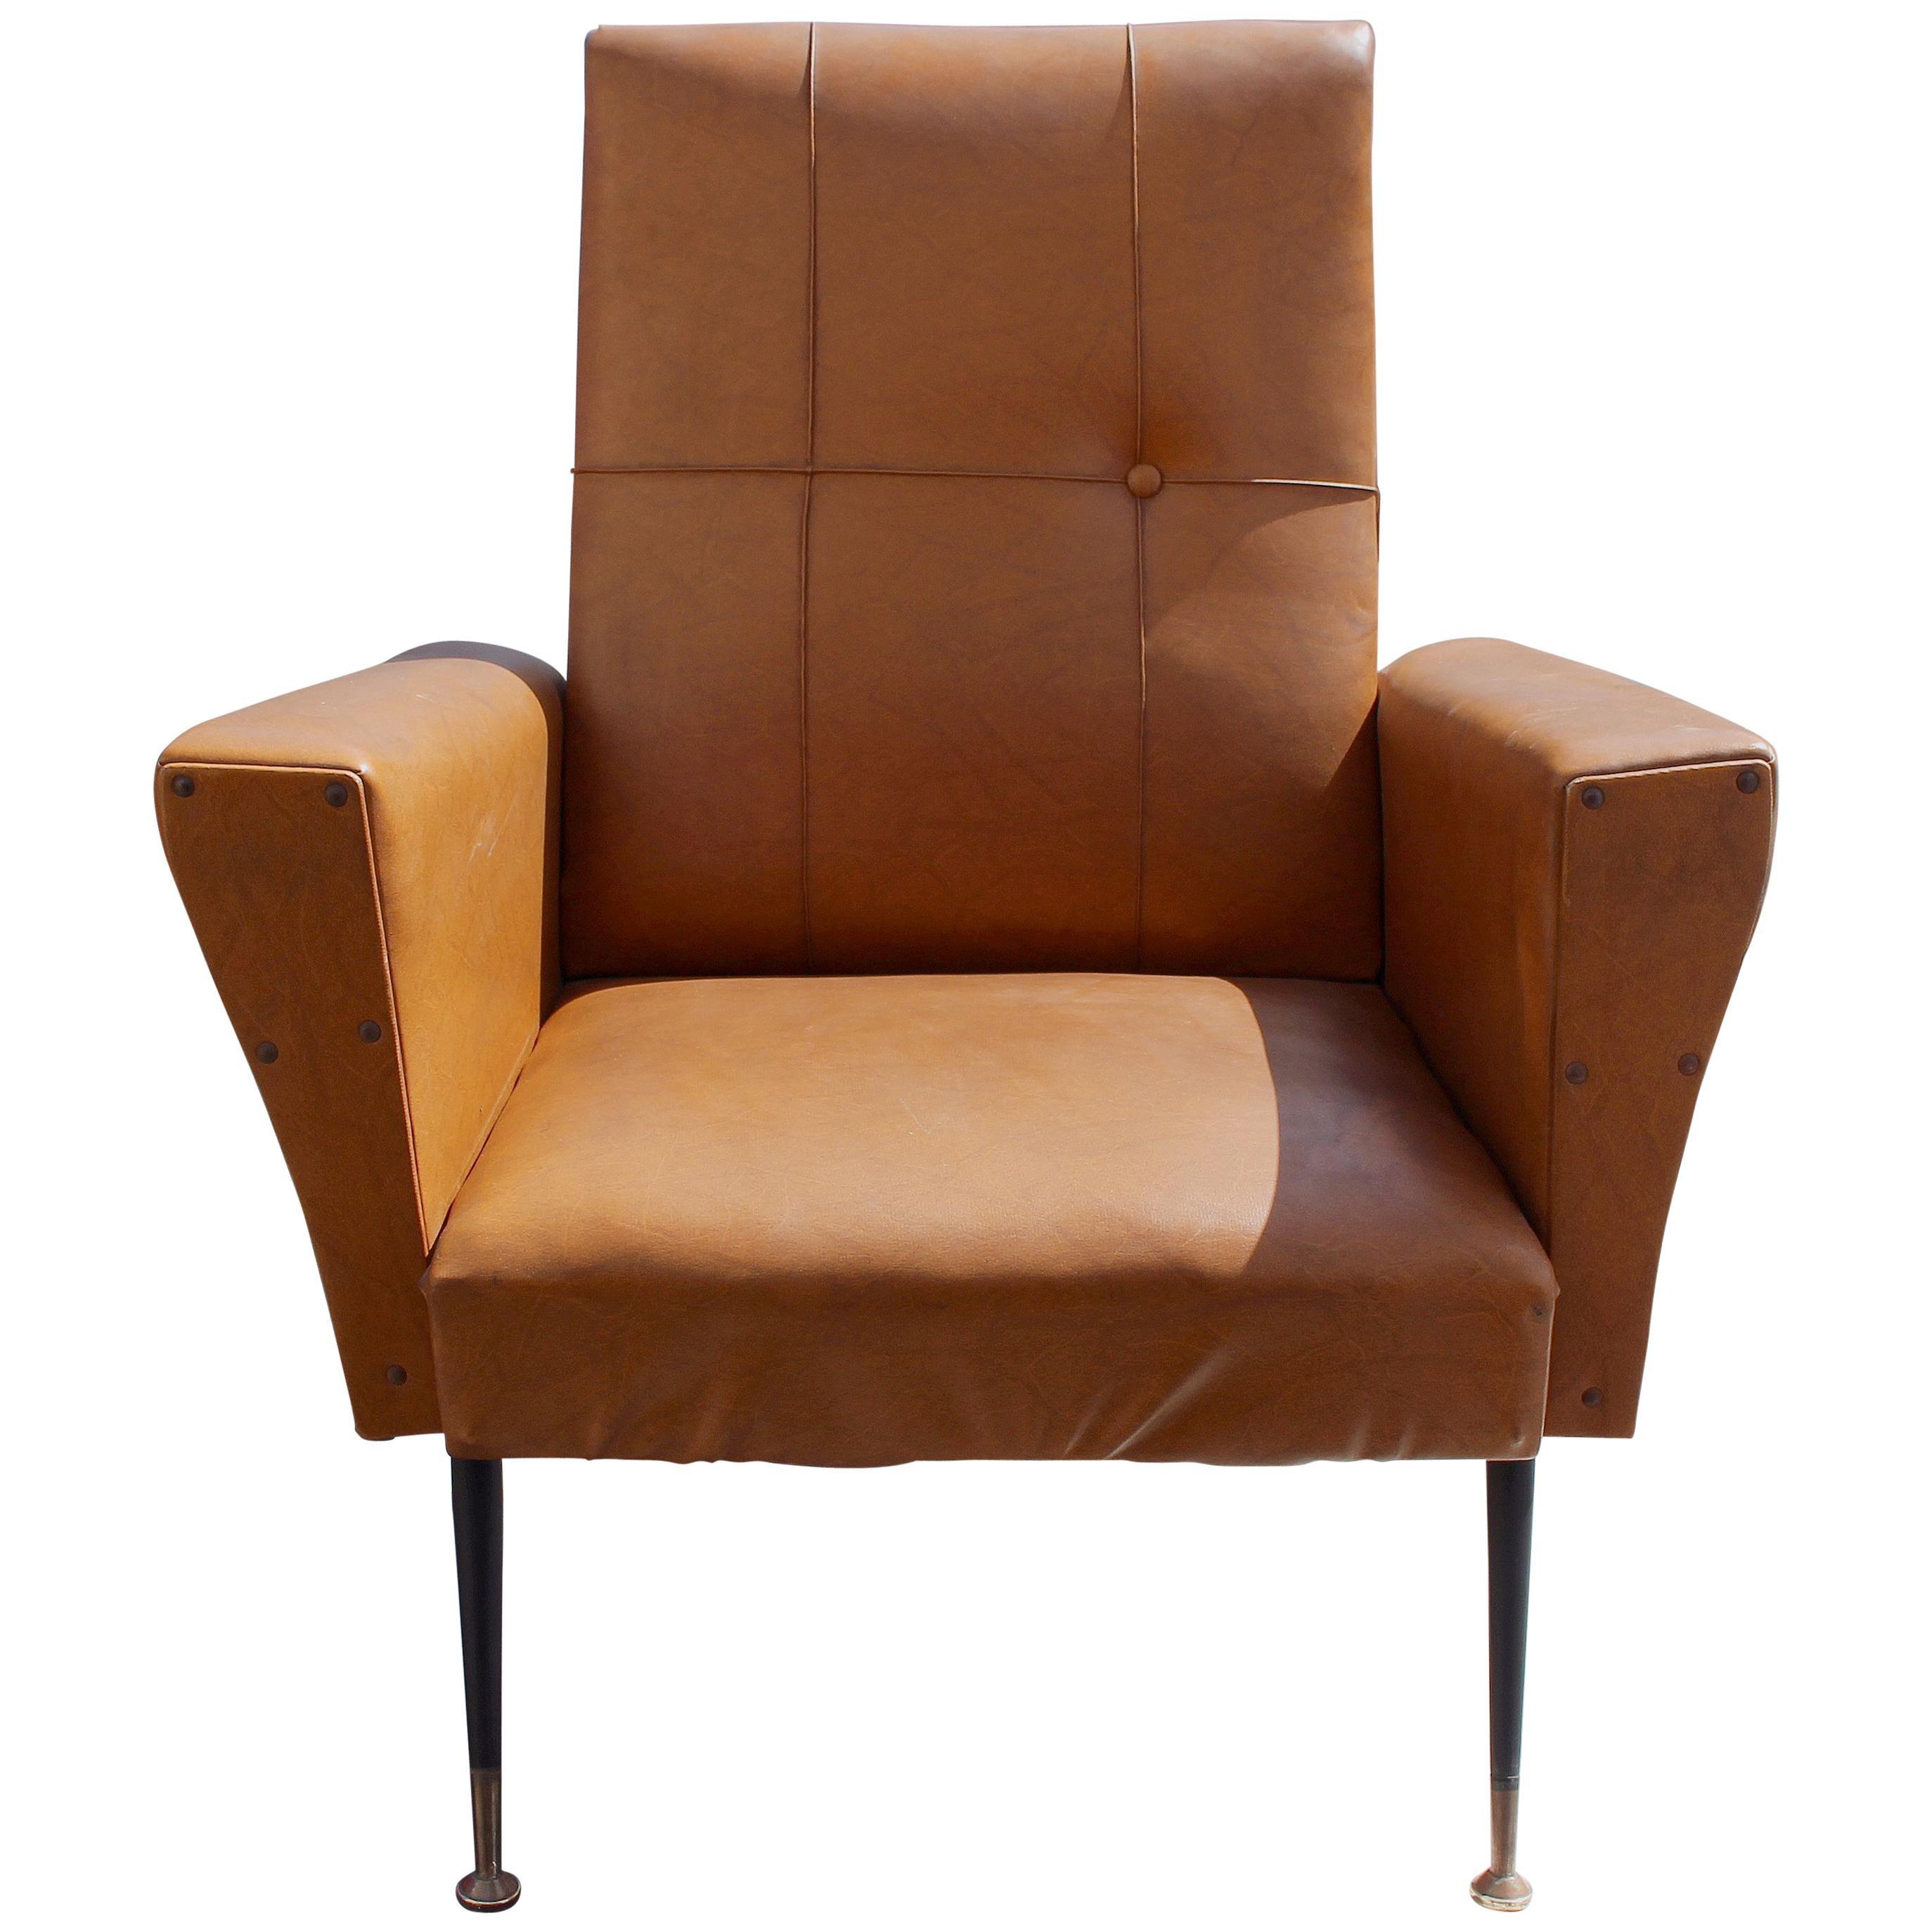 Italian Chair in Style of Gigi Radice